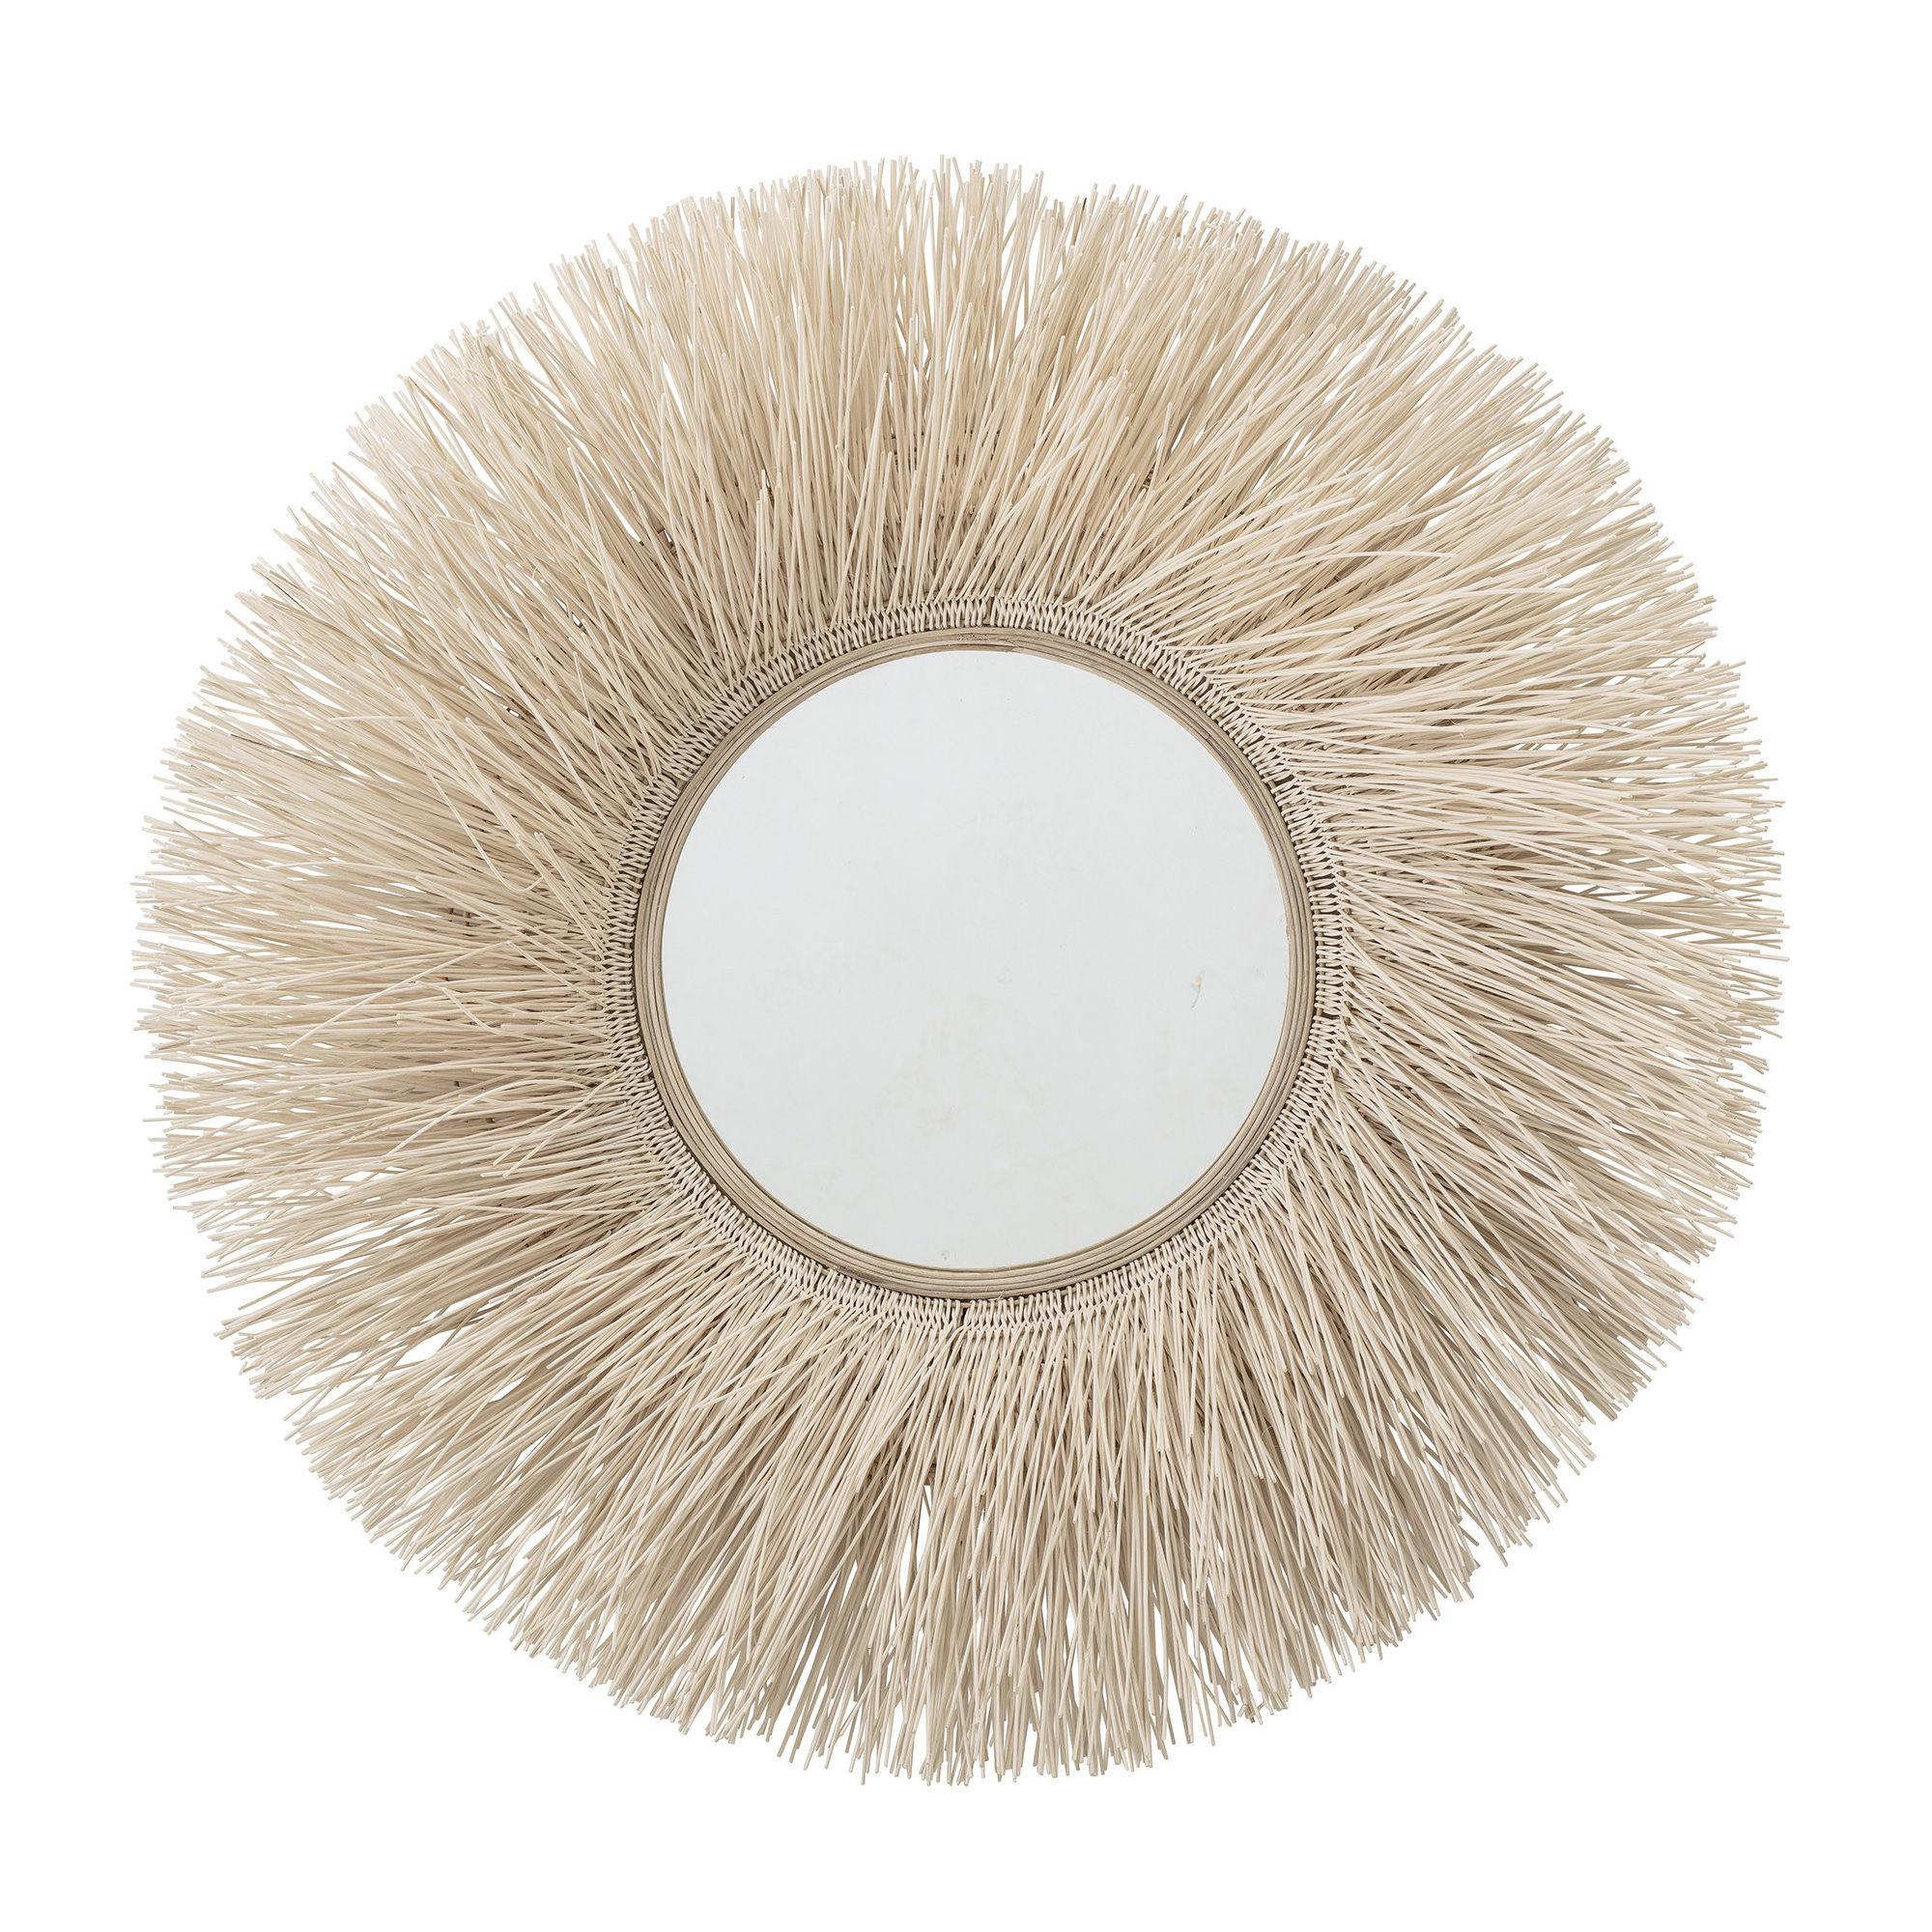 Dekoration - Spiegel - Miroir Wandspiegel / Ø 95 cm - Jute - Bloomingville - Natur - Glas, Jute